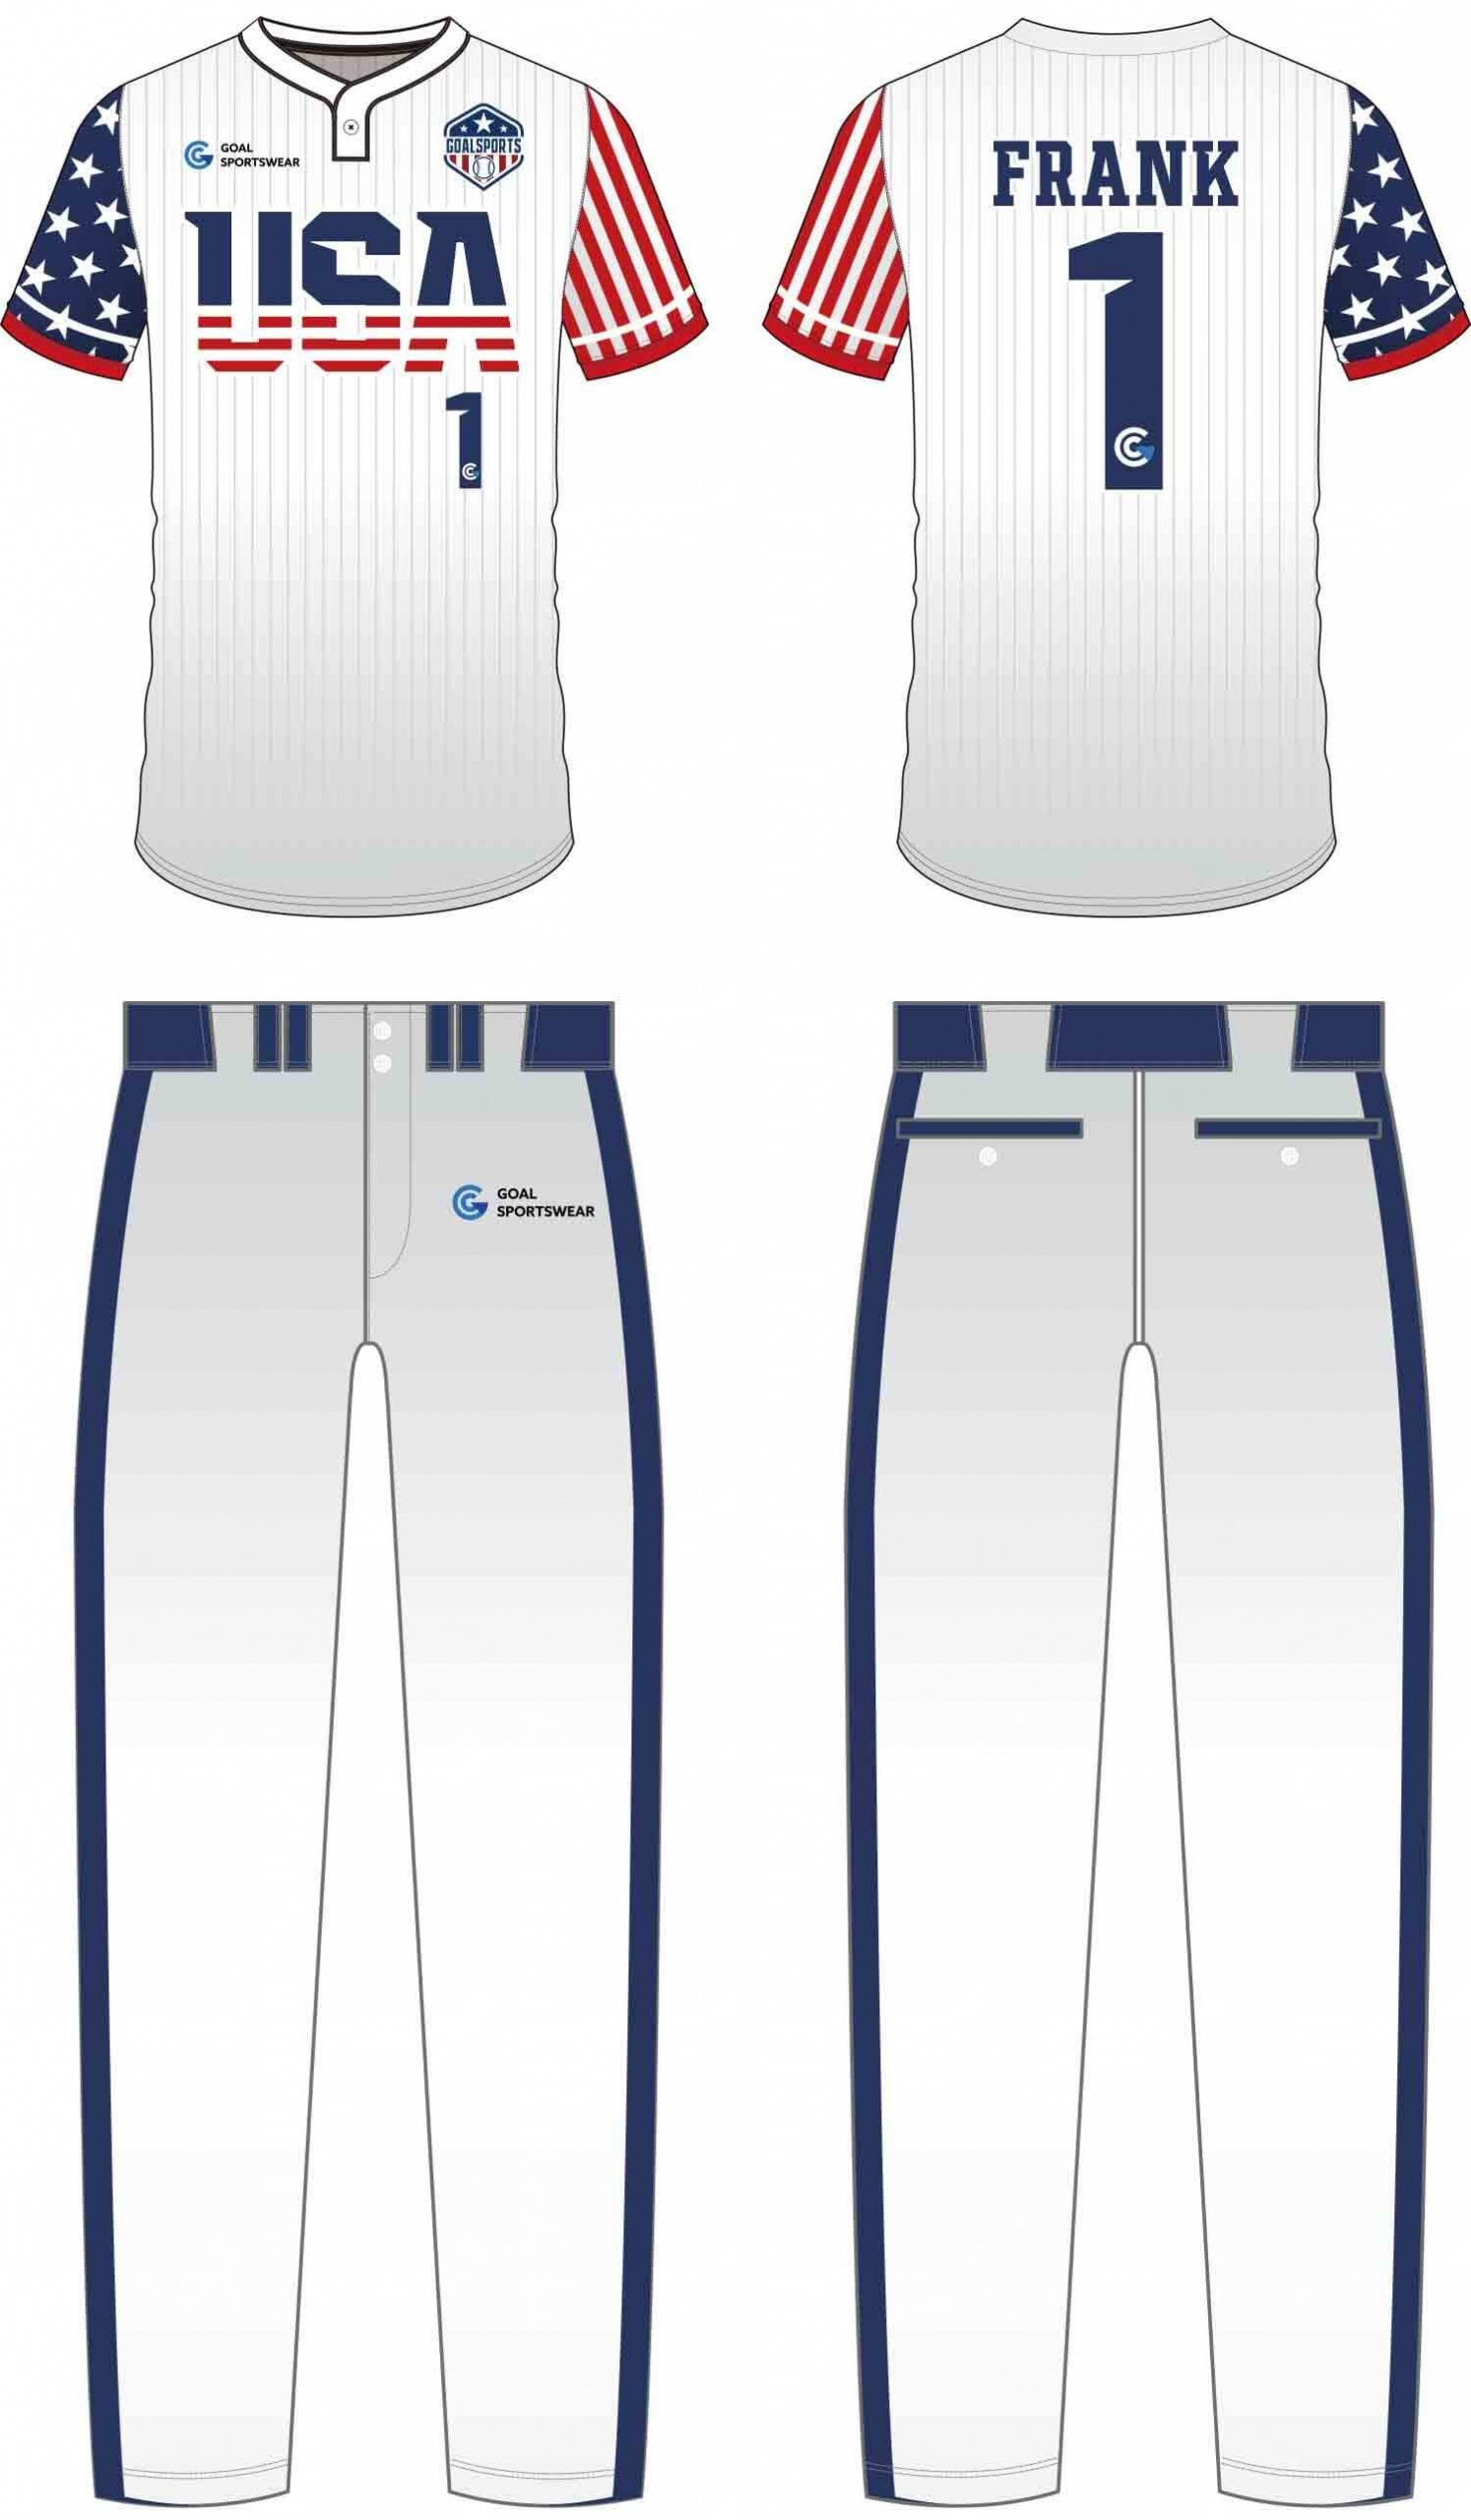 100% polyester sublimation mens custom Custom Youth Softball Uniforms